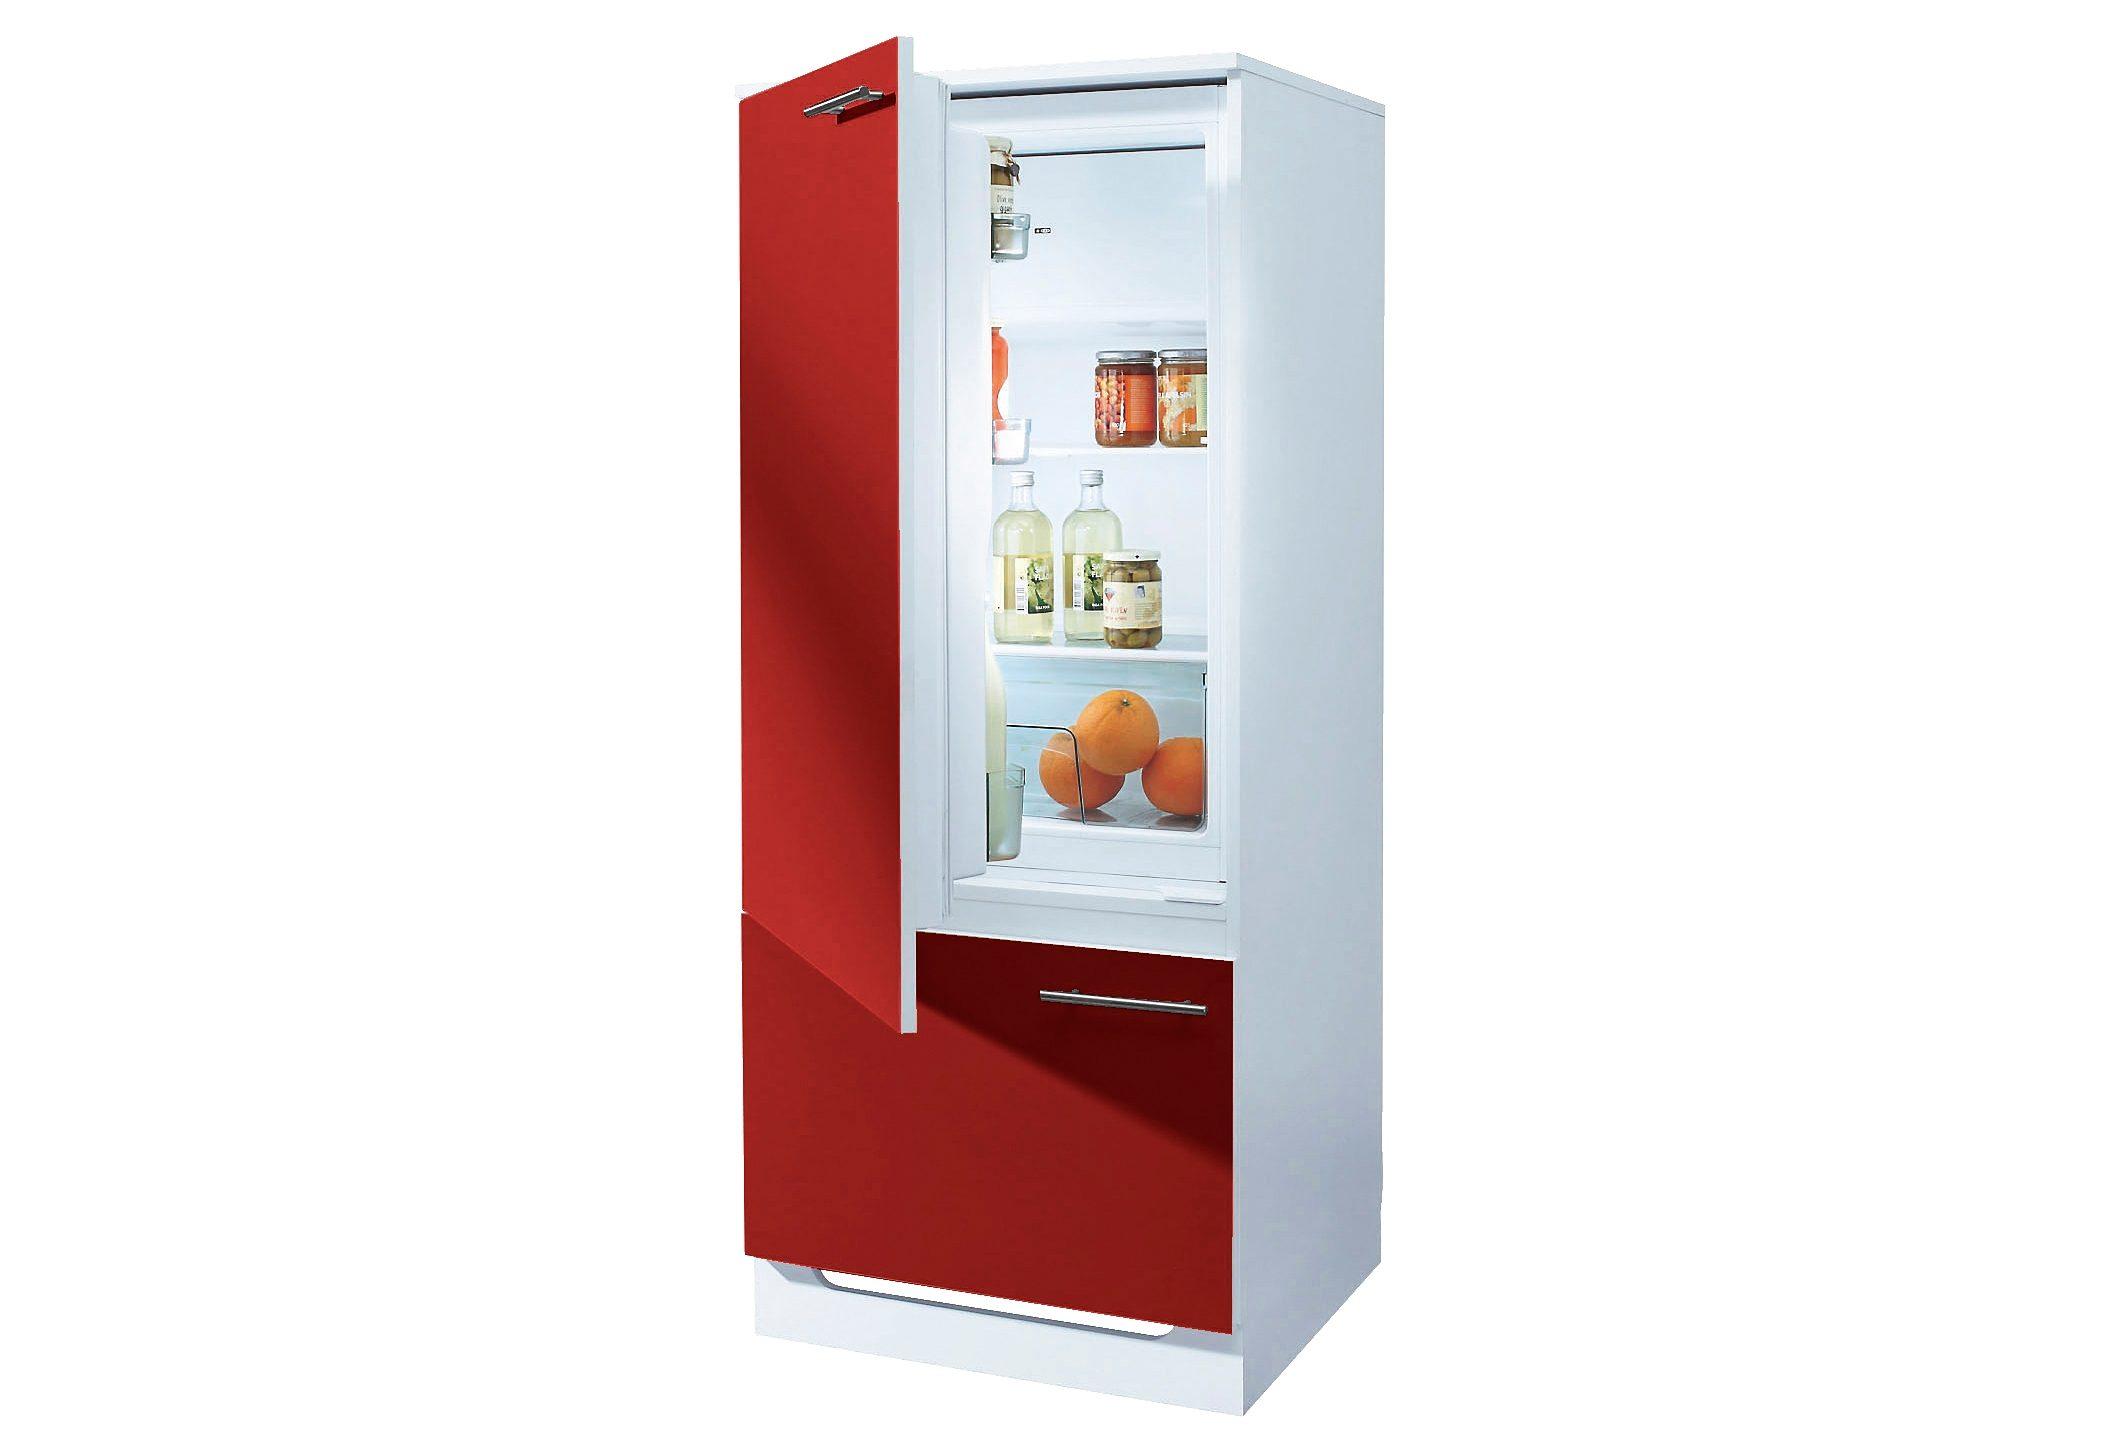 Amica Kühlschrank Laut : Kühlmodul ahus« mit kühlschrank amica eks « online